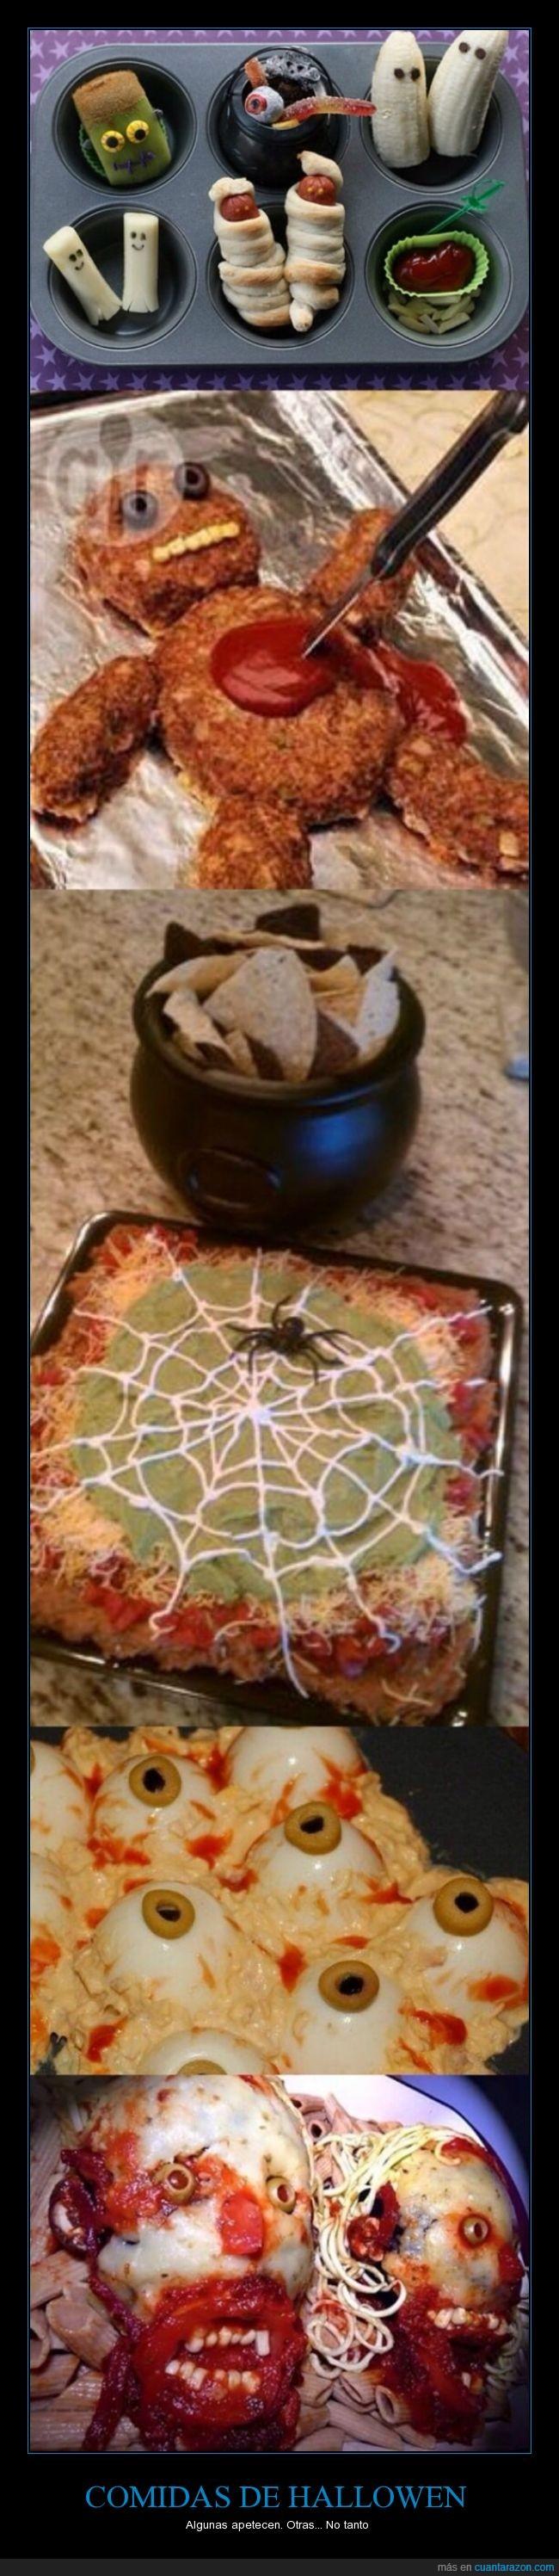 alimento,comidas,disfrutan,Halloween,sesos,zombie